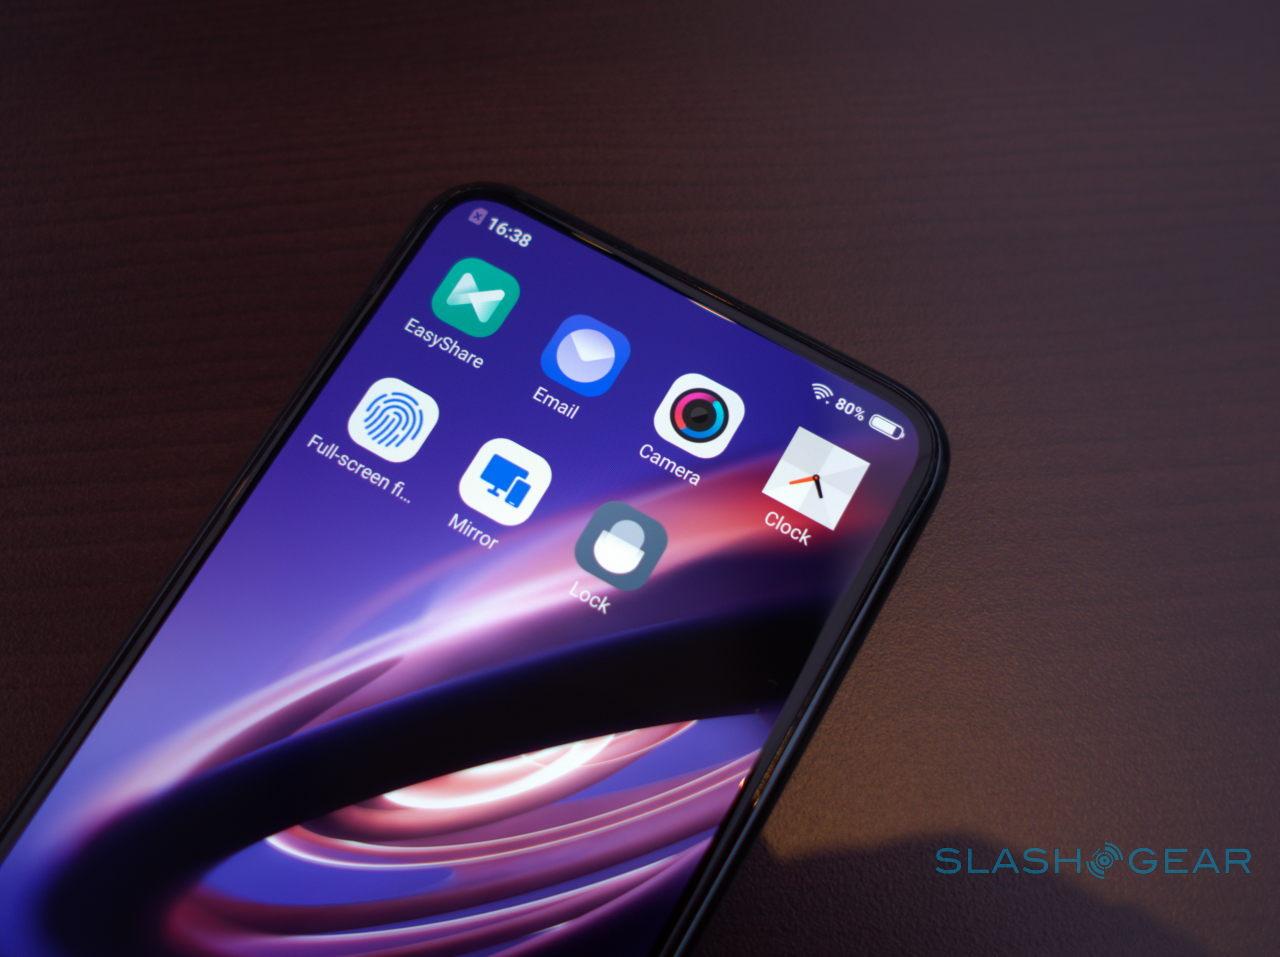 Vivo APEX 2019 concept phone hands-on – A look into Vivo's future